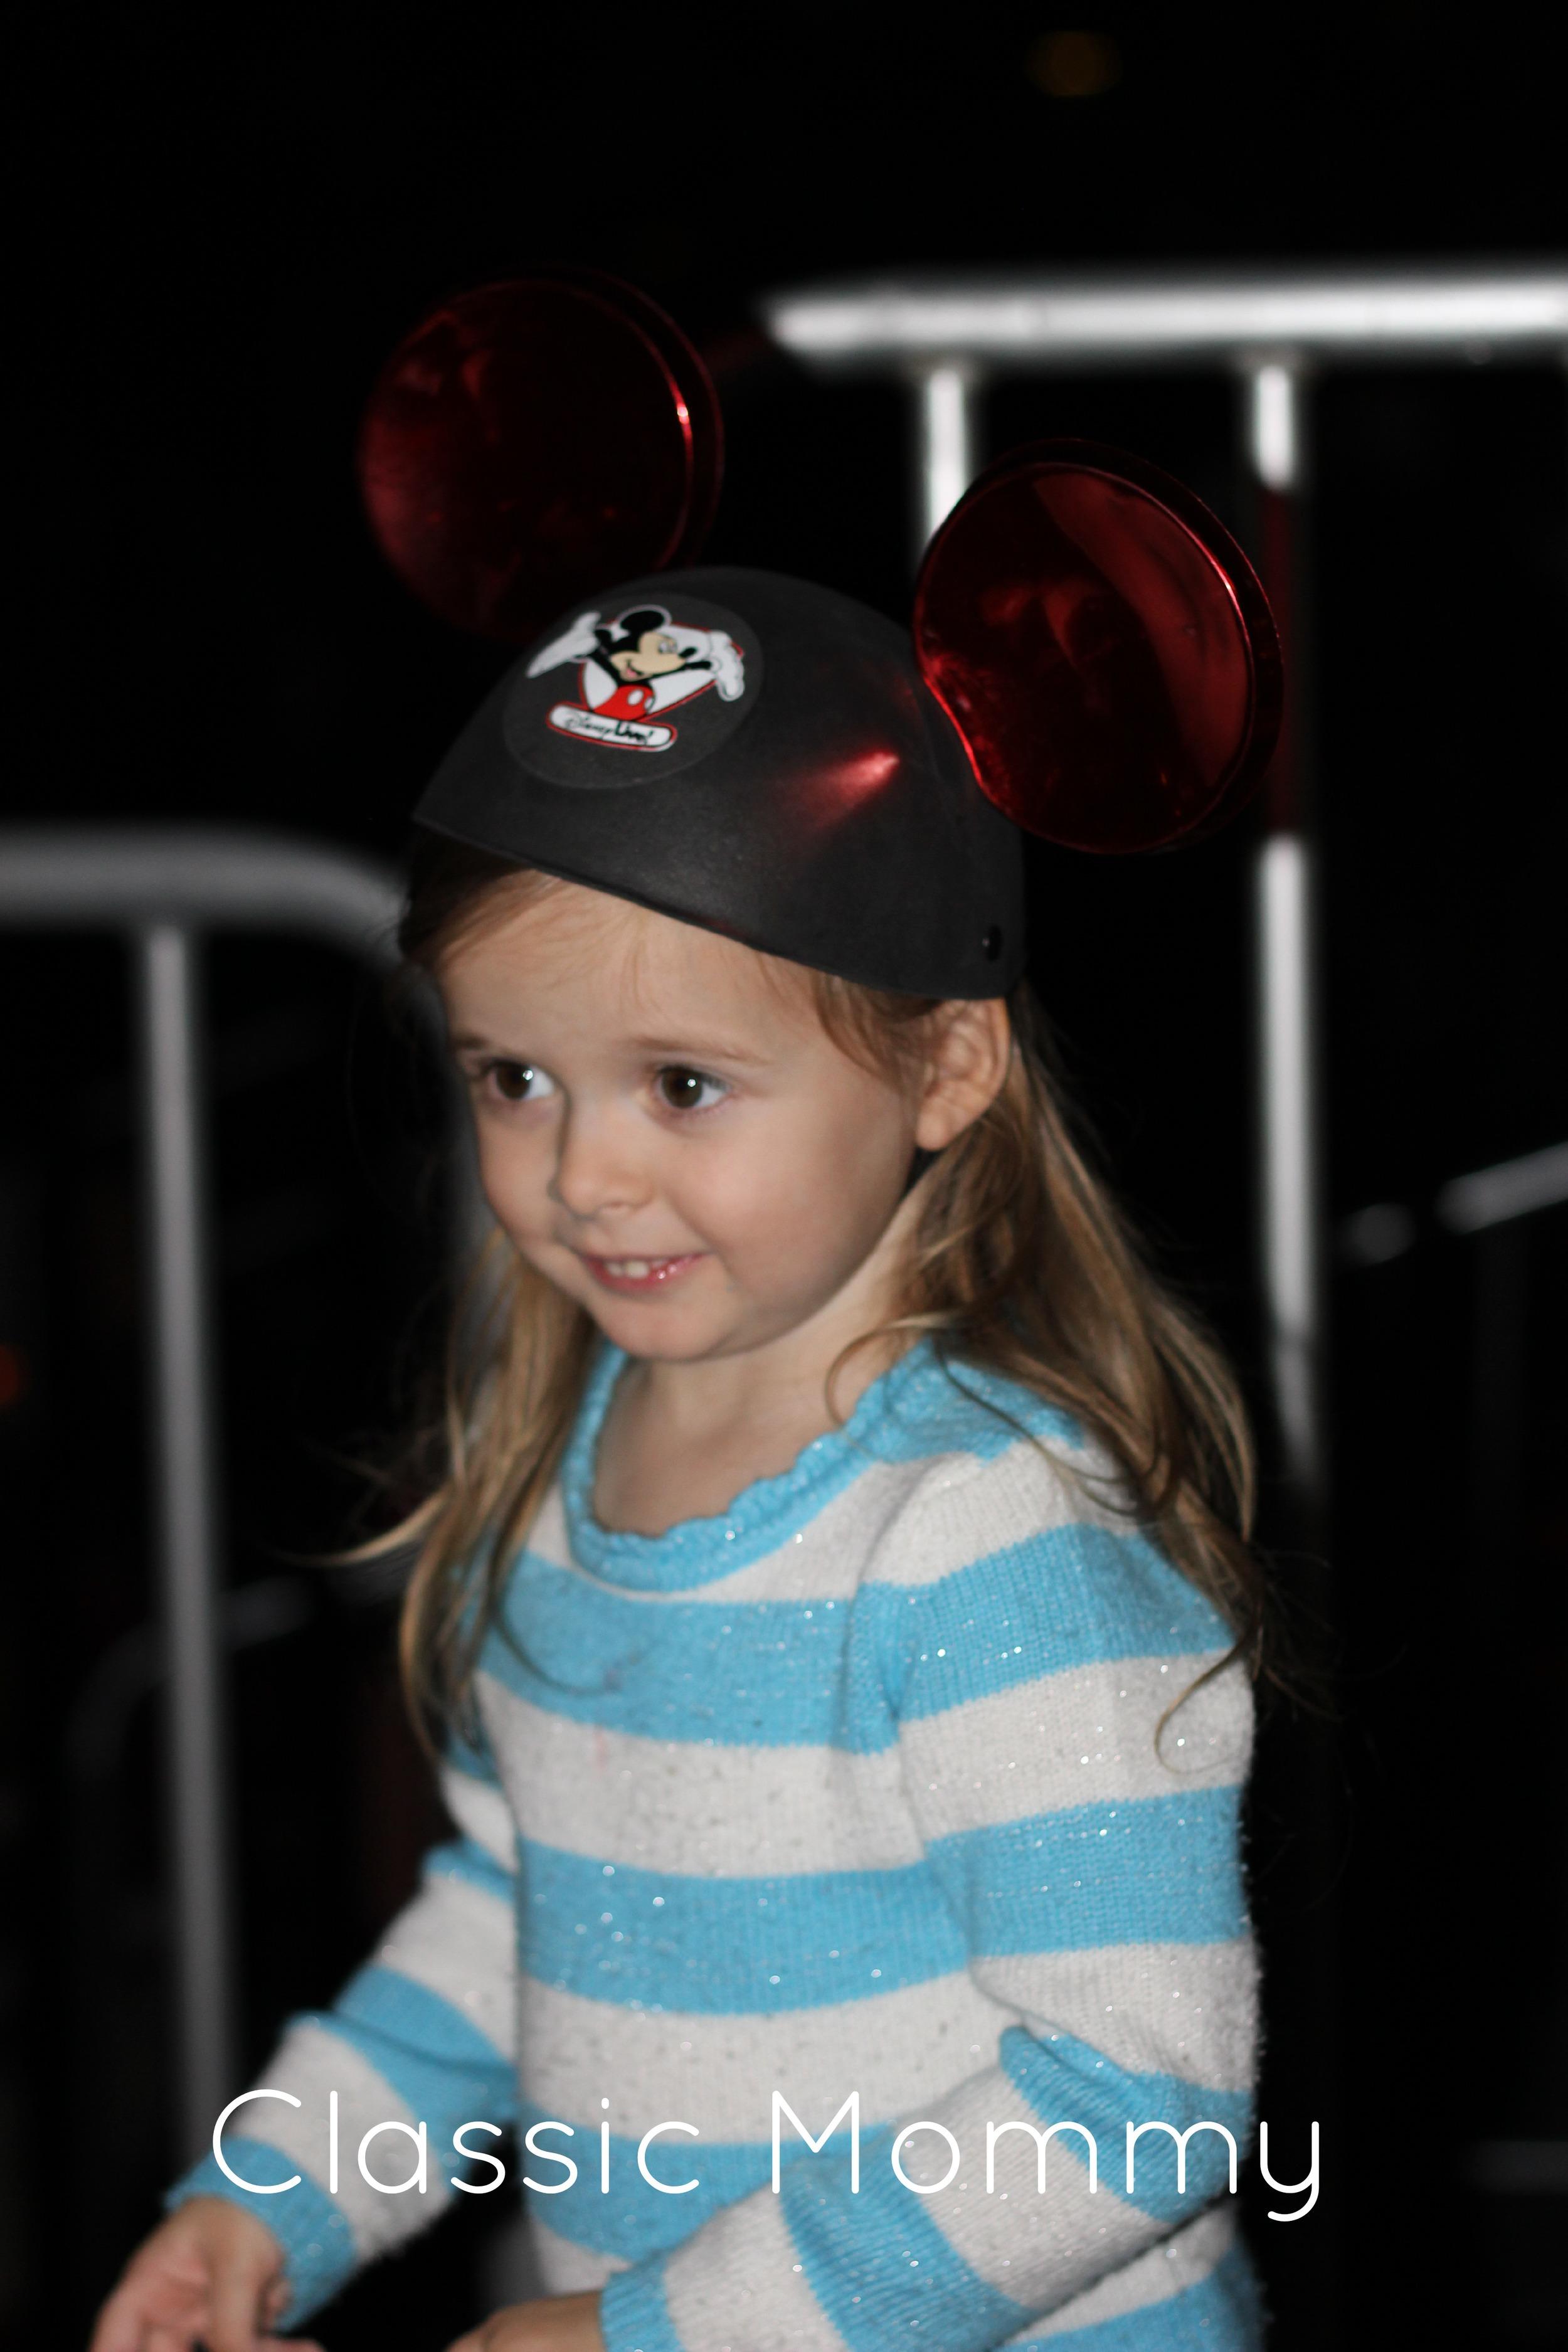 Disney Live! Dance